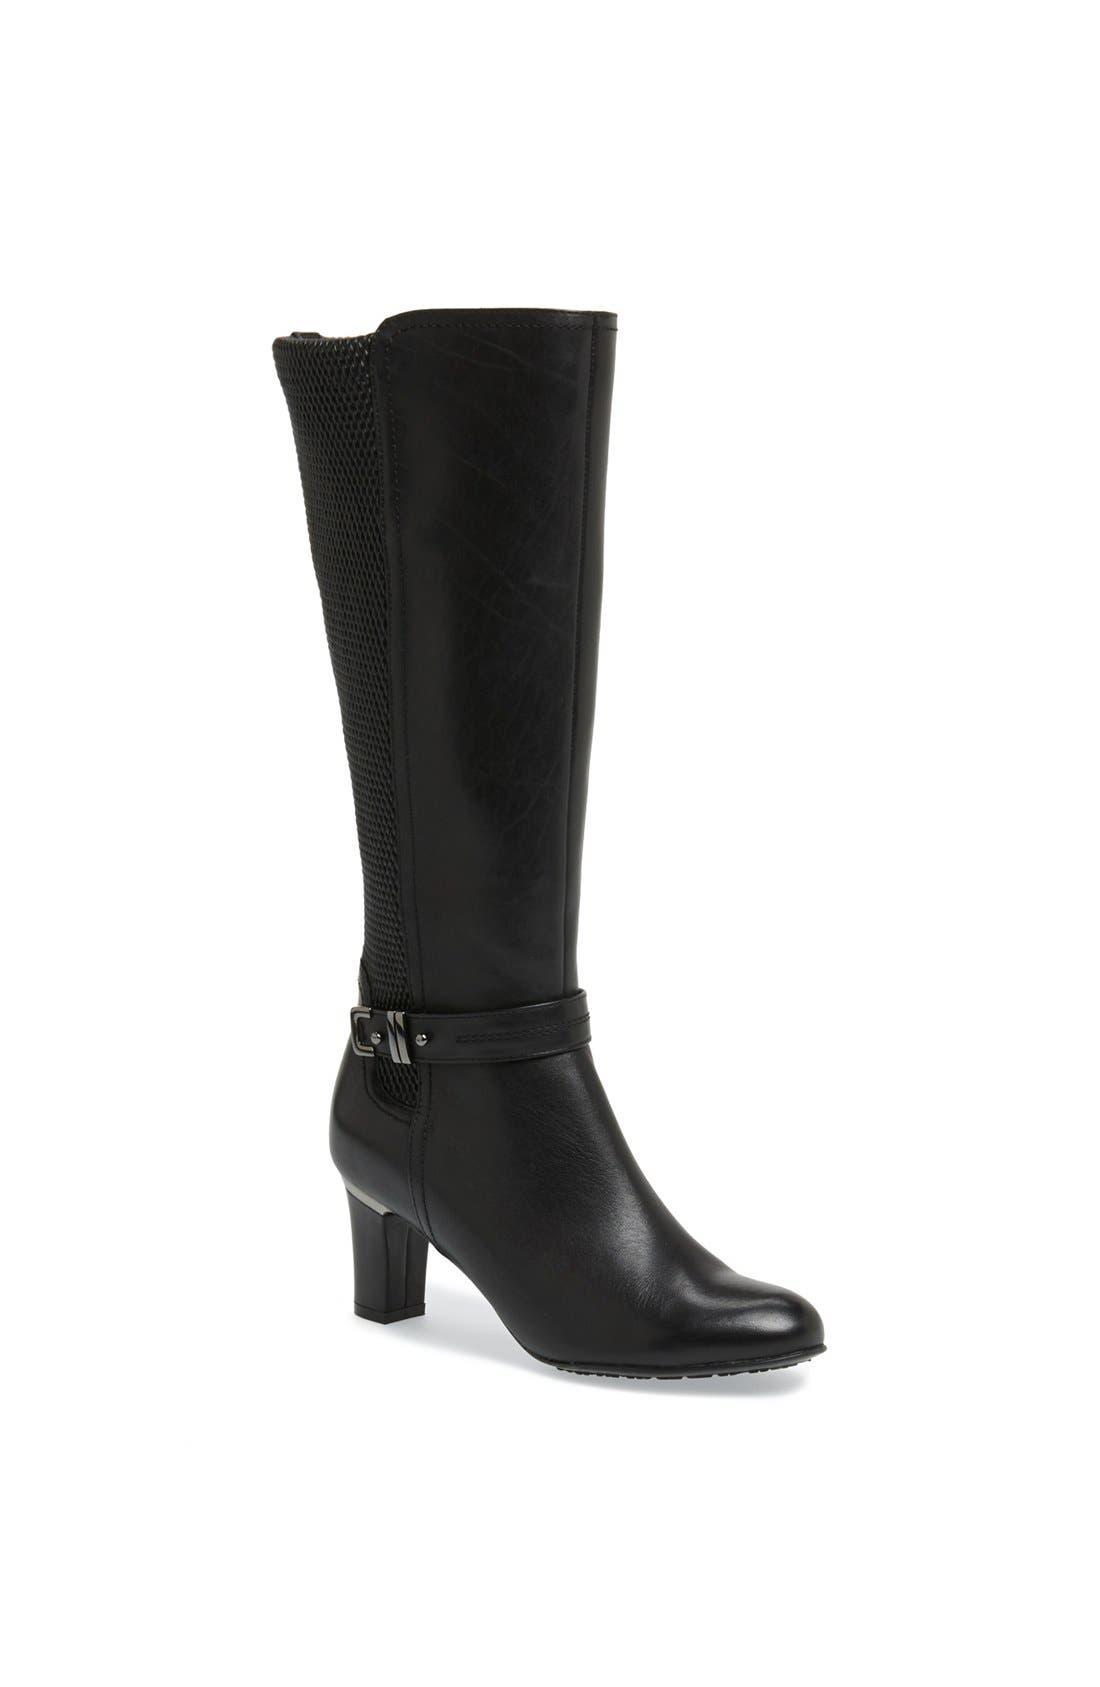 Alternate Image 1 Selected - Blondo 'Prielle' Boot